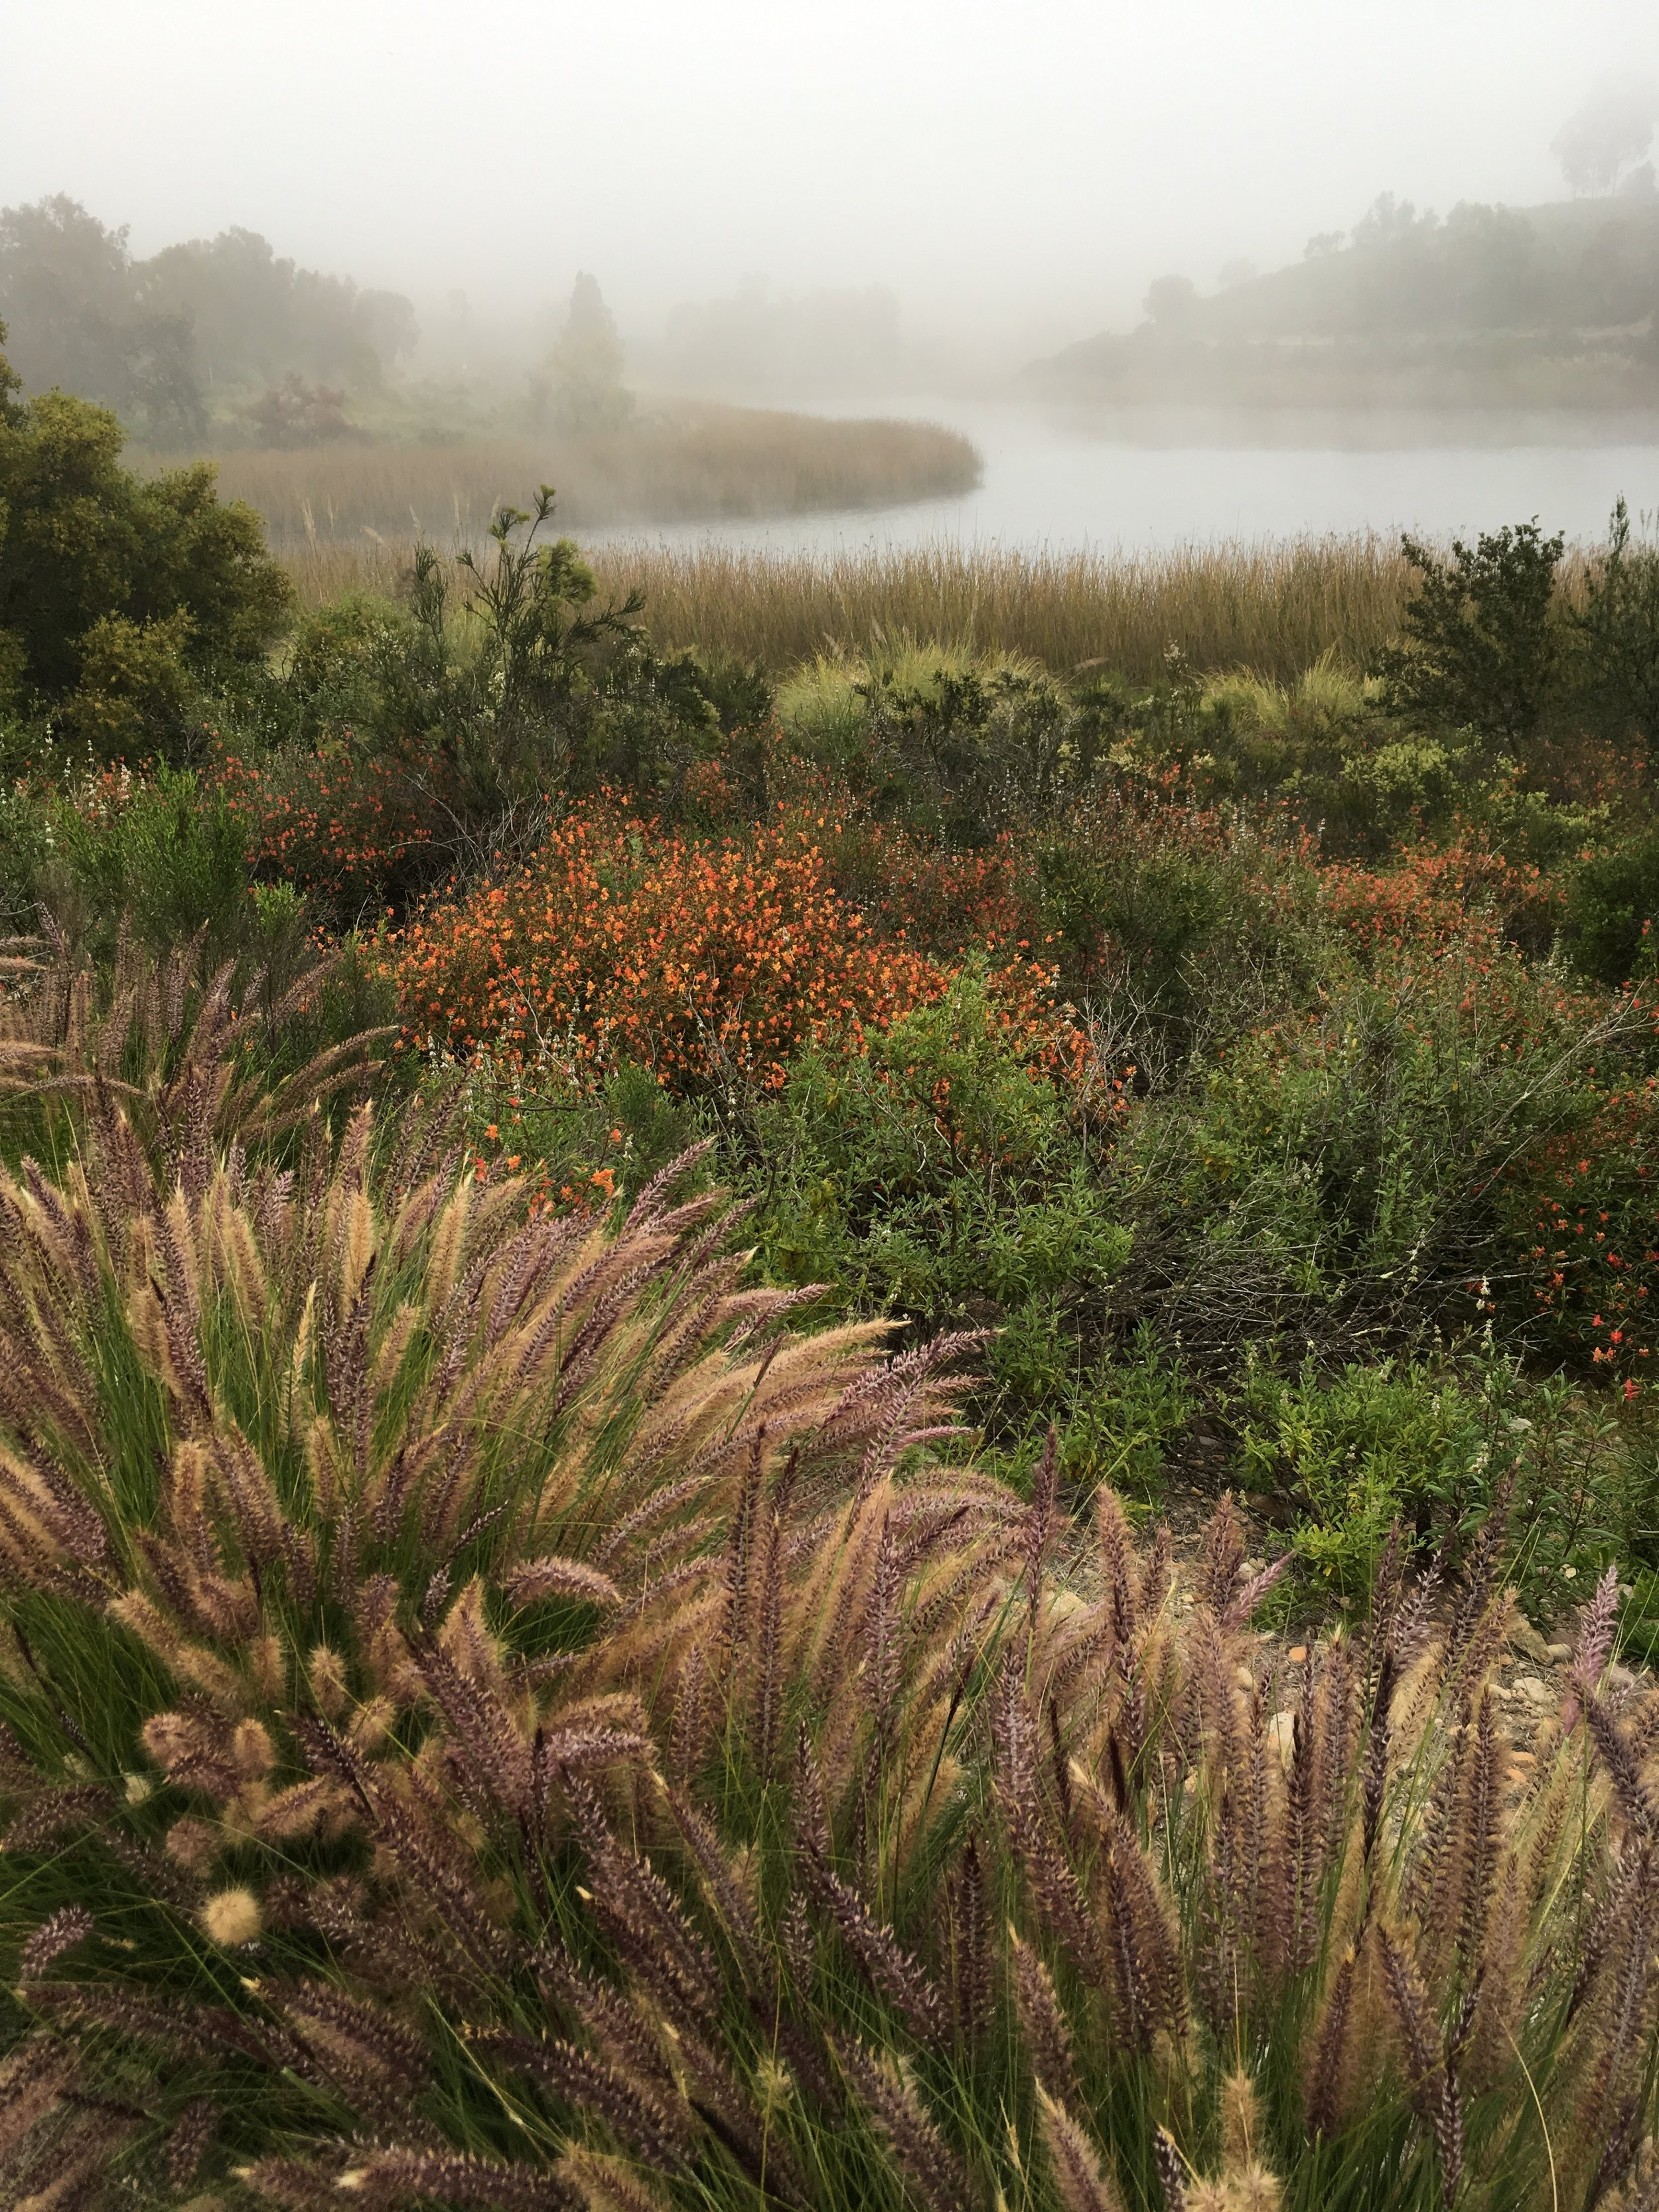 Lake flora on a foggy morning.